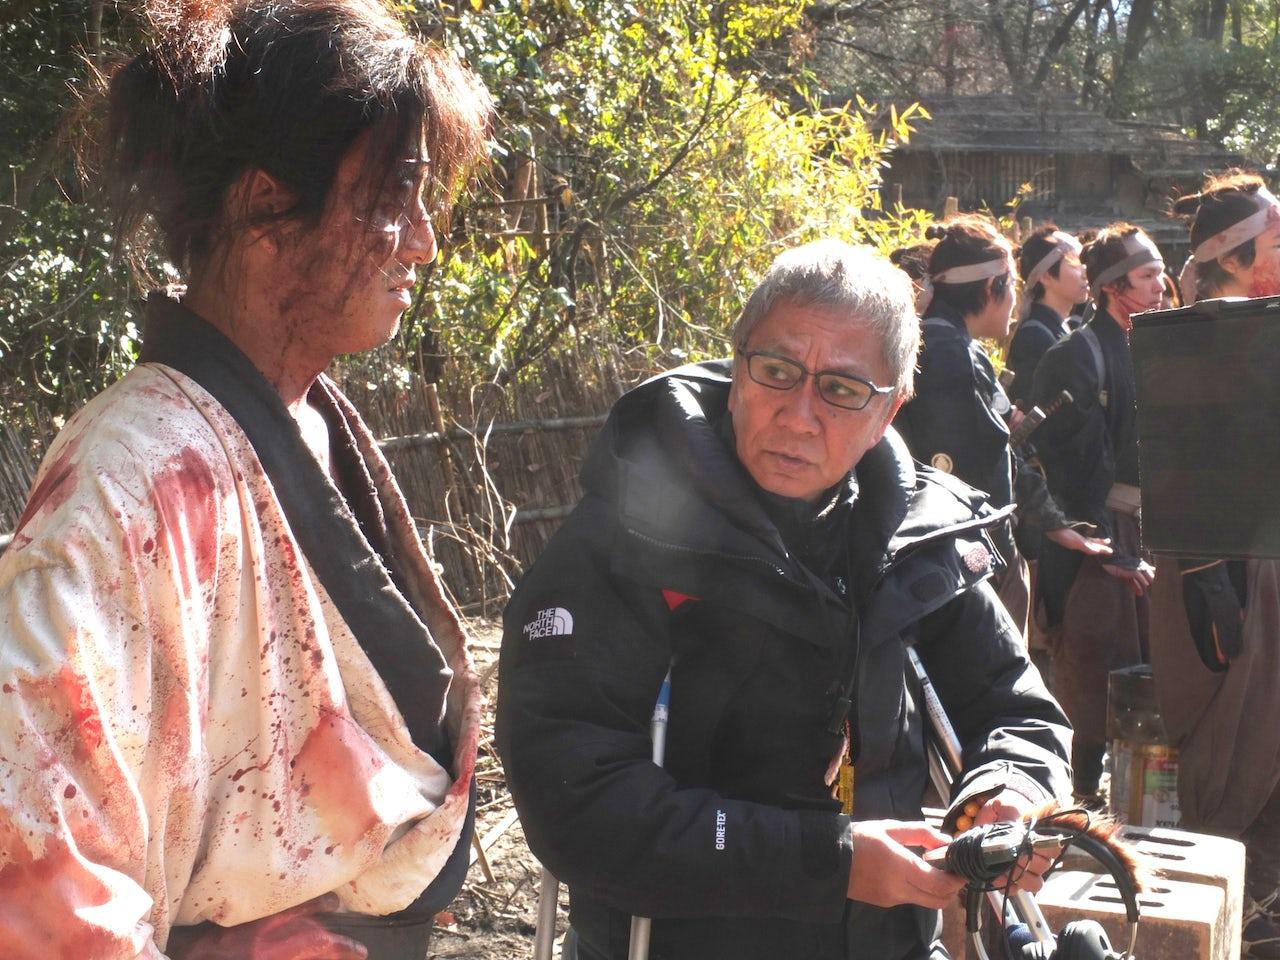 Takashi Miike speaks with lead actor Takuya Kimura (Manji) on the set of Blade of the Immortal.